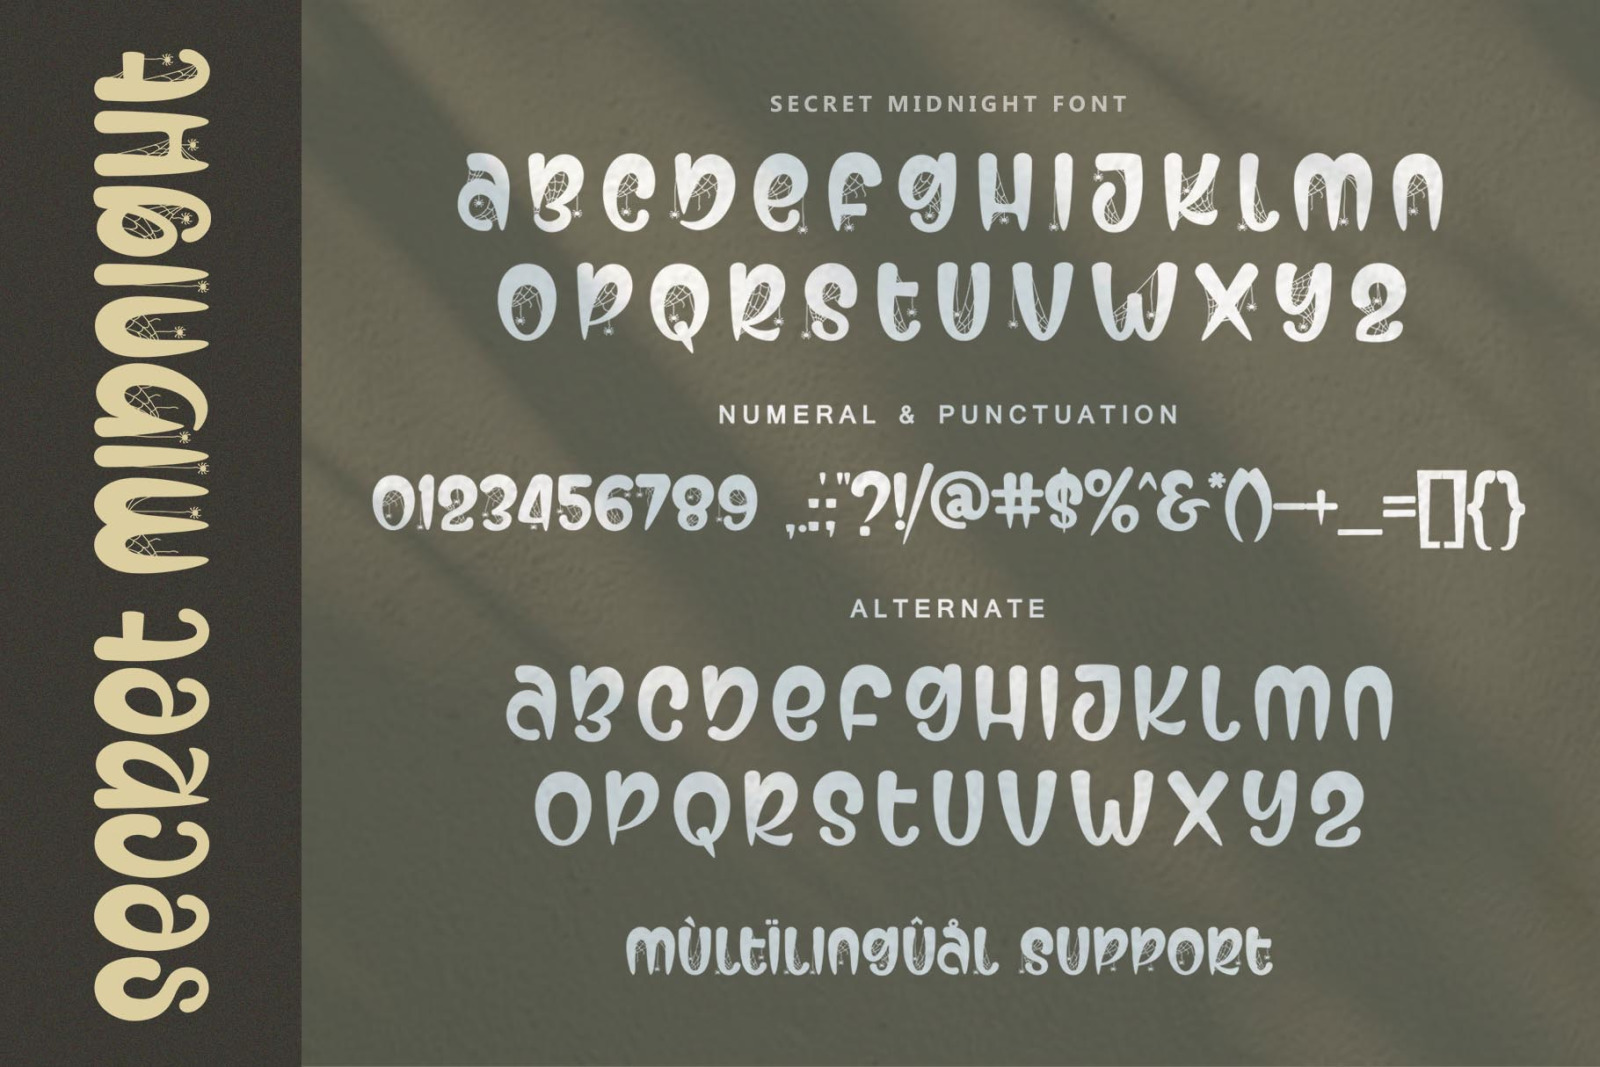 Secret Midnight Spooky Font